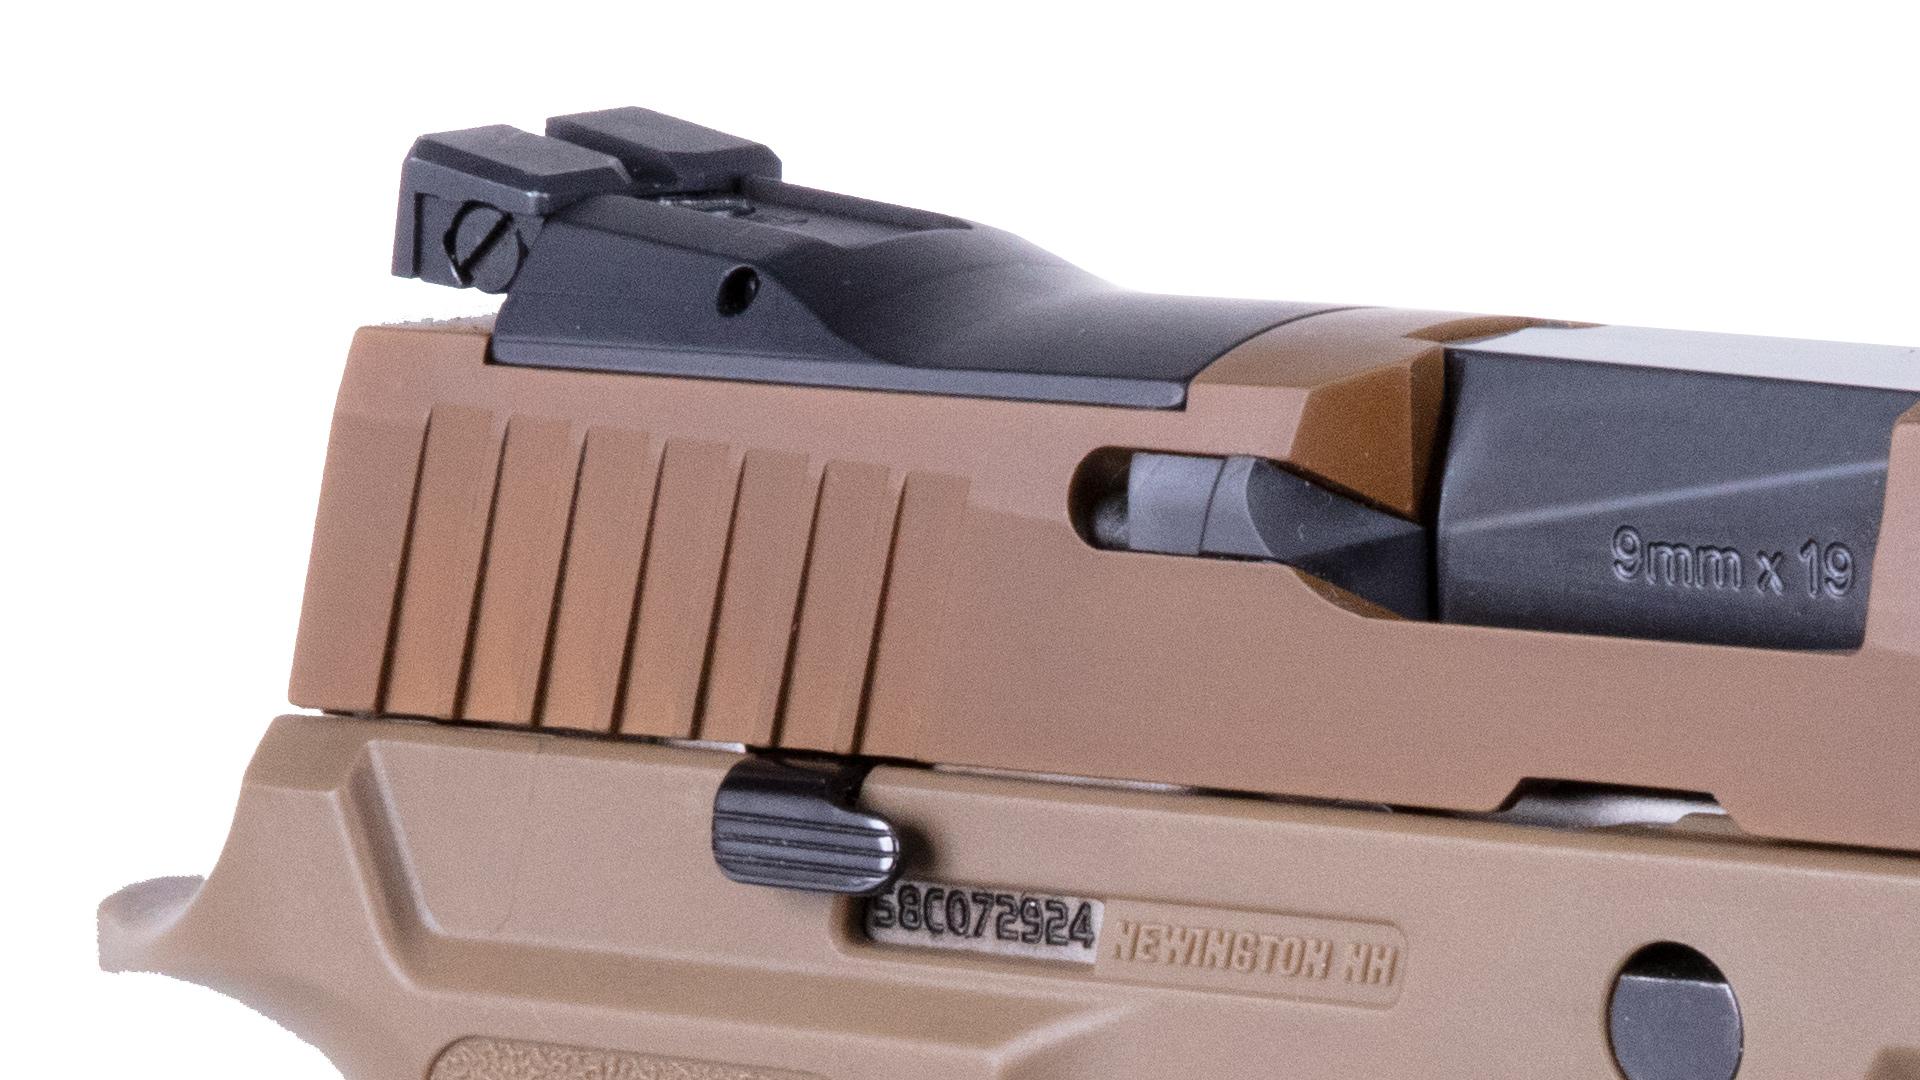 SIG Sauer P320 XFive Coyote - 9mm